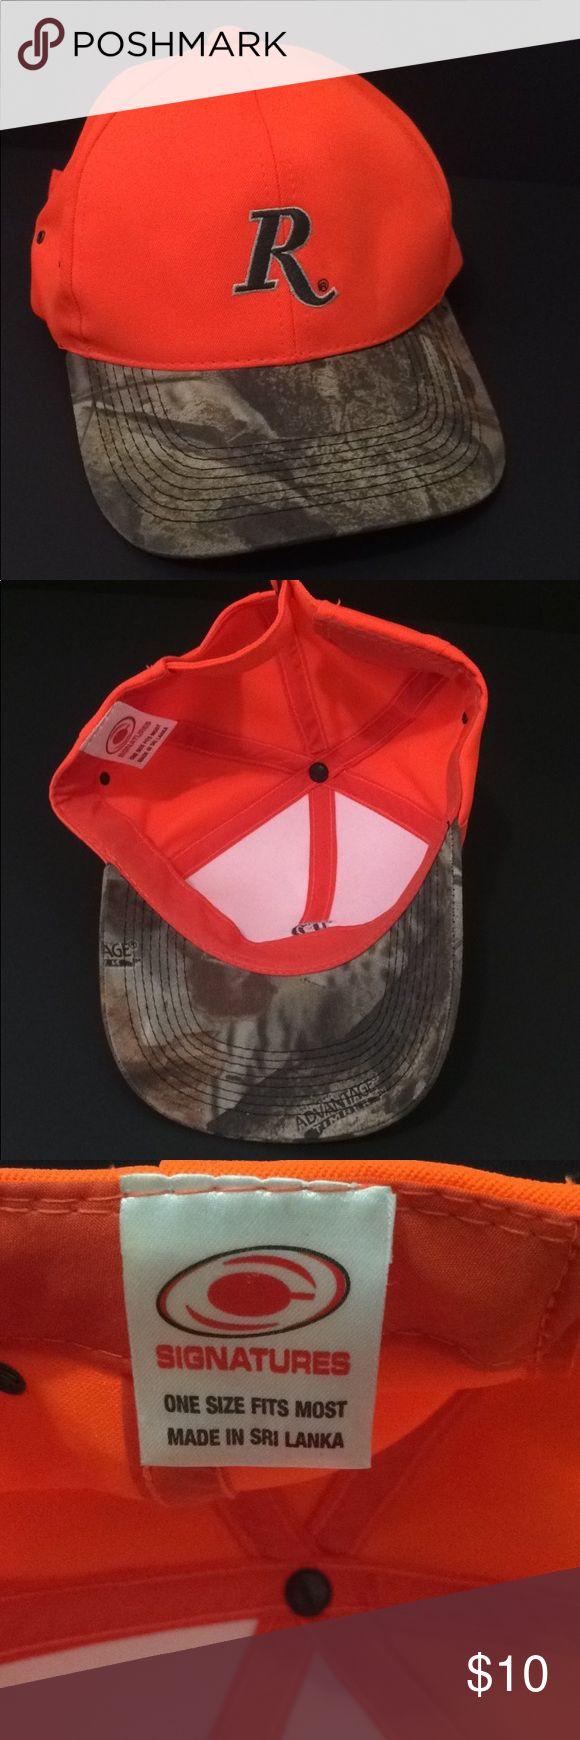 [Remington] Orange Camo Men's Hat Baseball Cap Euc Hunting orange cap Camo bill Remington gun brand Worn once in excellent, clean condition! remington Accessories Hats